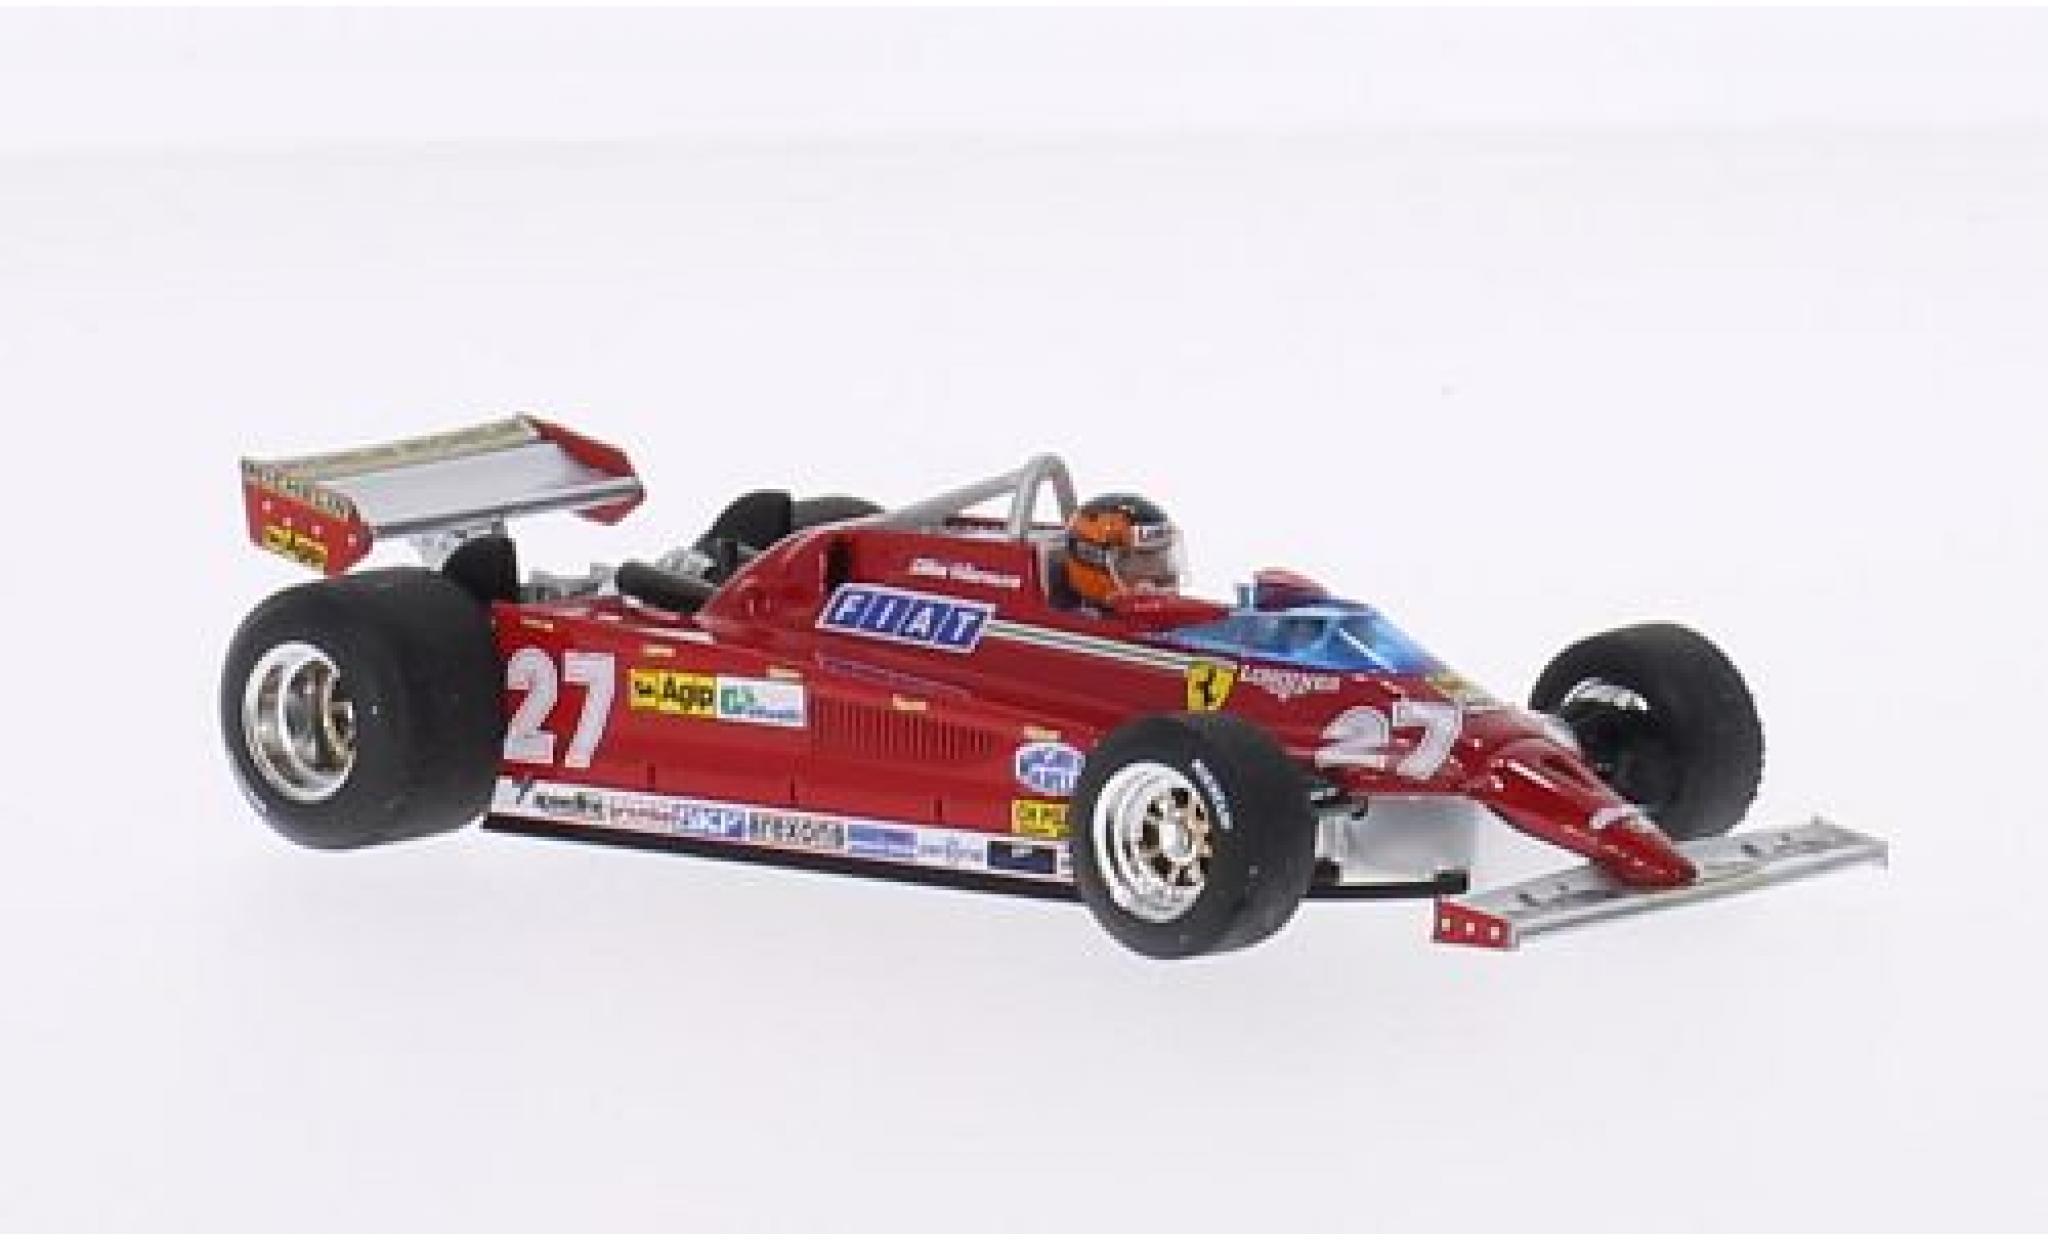 Ferrari 126 1/43 Brumm CK Turbo No.27 Suderia Formel 1 GP Monte Carlo 1981 avec figurine de conducteur G.Villeneuve